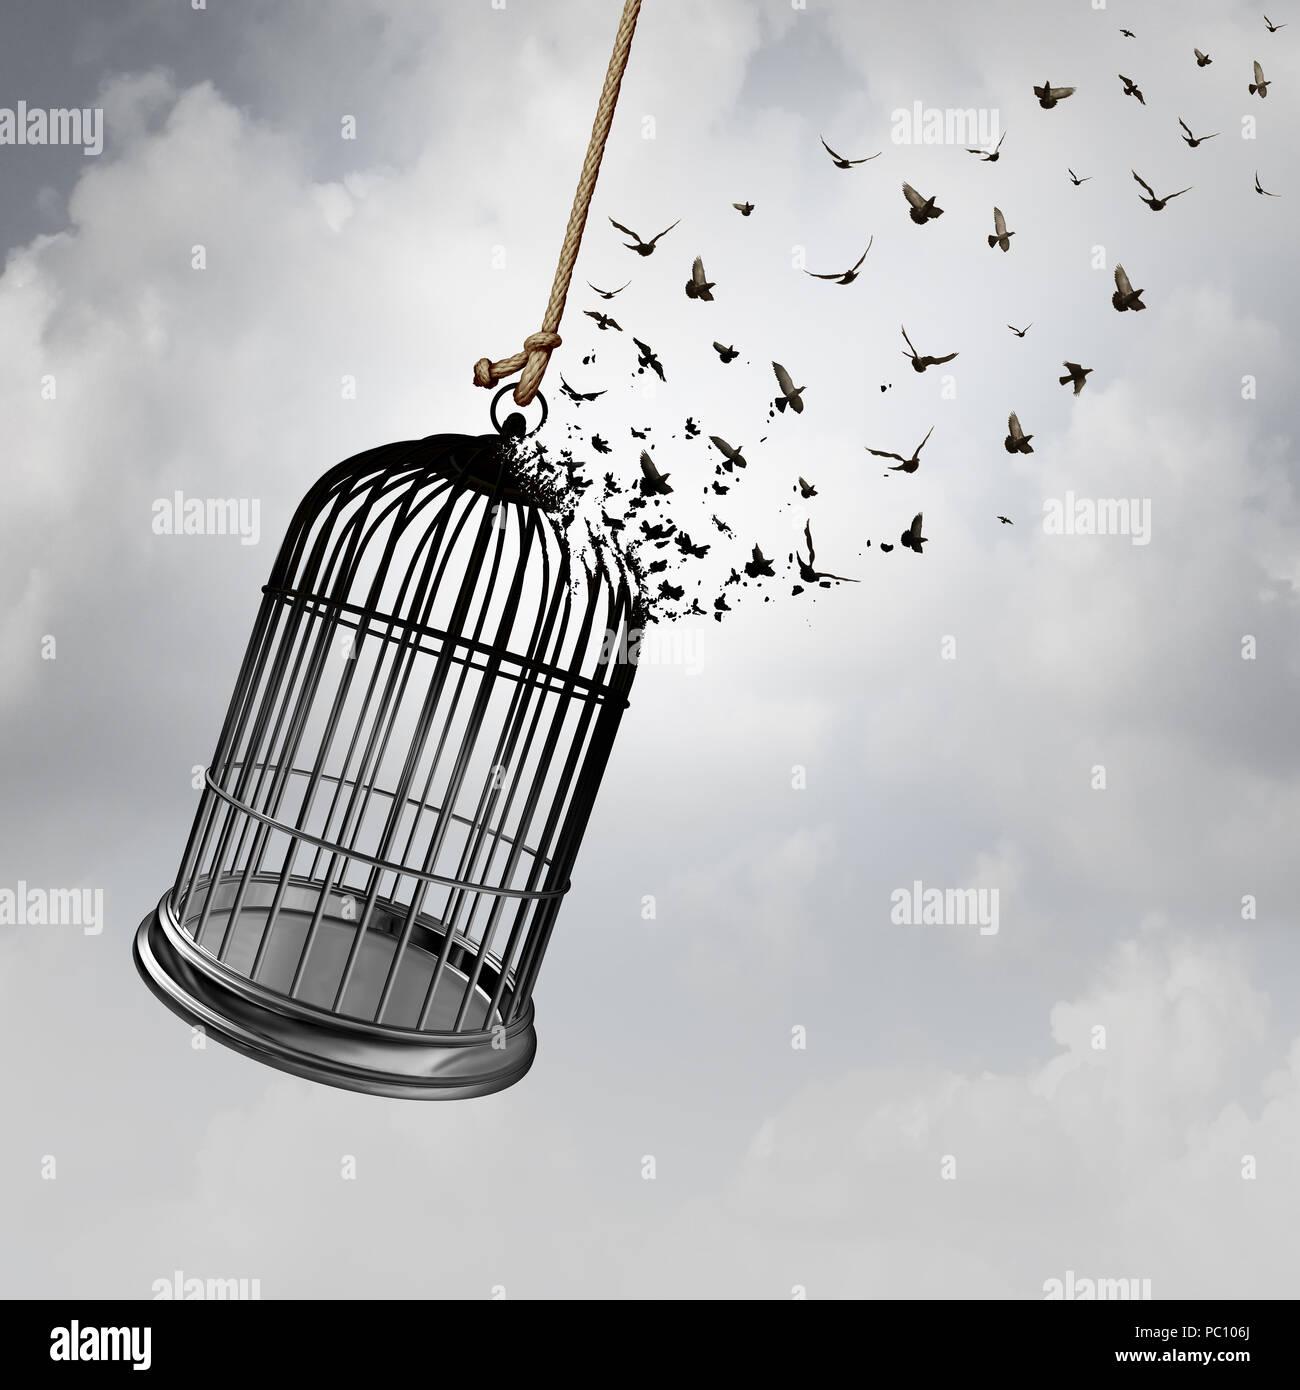 La idea de libertad con un giro en forma de jaula en las aves que vuelan como un cautiverio concepto abstracto con 3D rendering elementos. Imagen De Stock